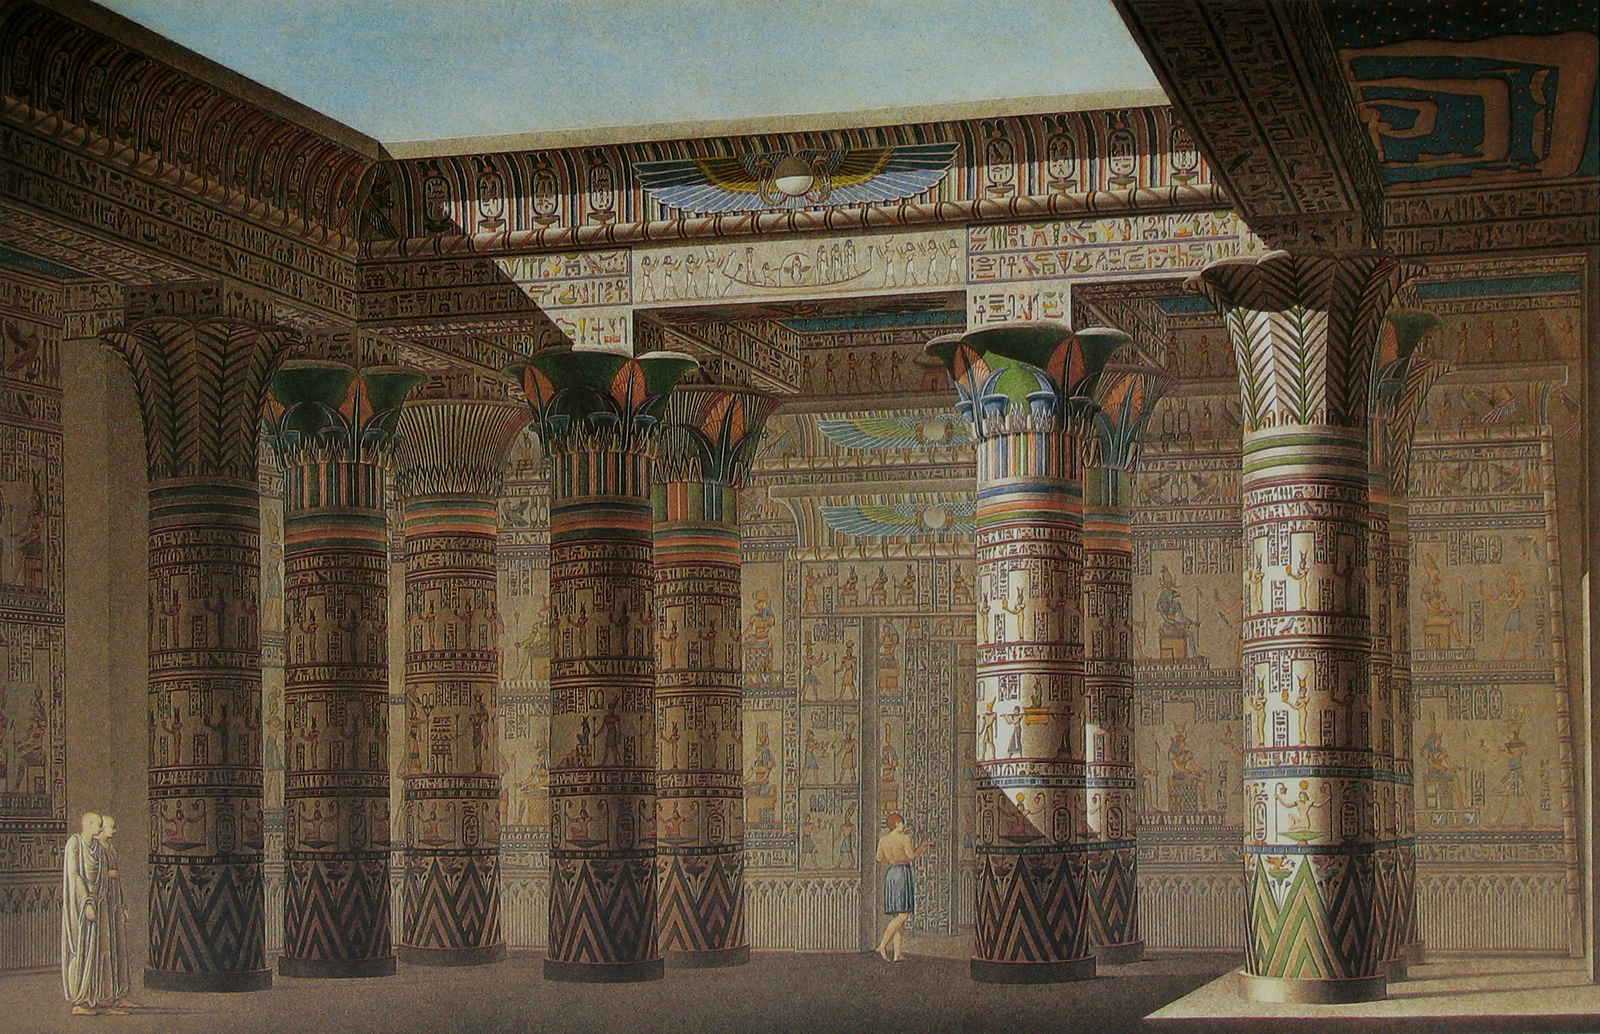 معبد فيلة اسوان بالصور